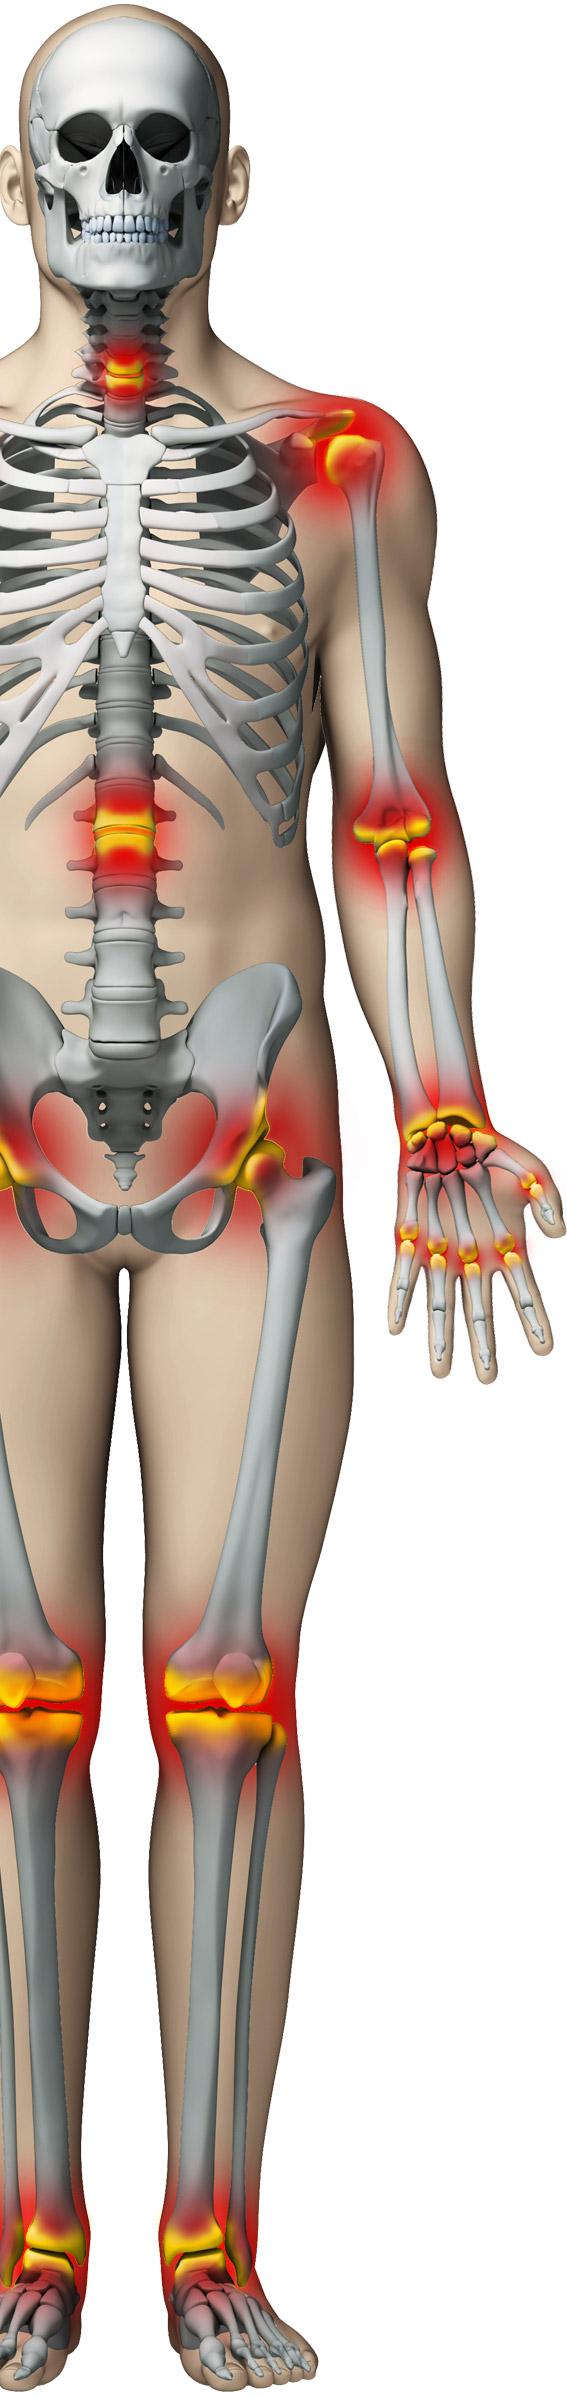 Afla totul despre artroza: Simptome, tipuri, diagnostic si tratament   studioharry.ro